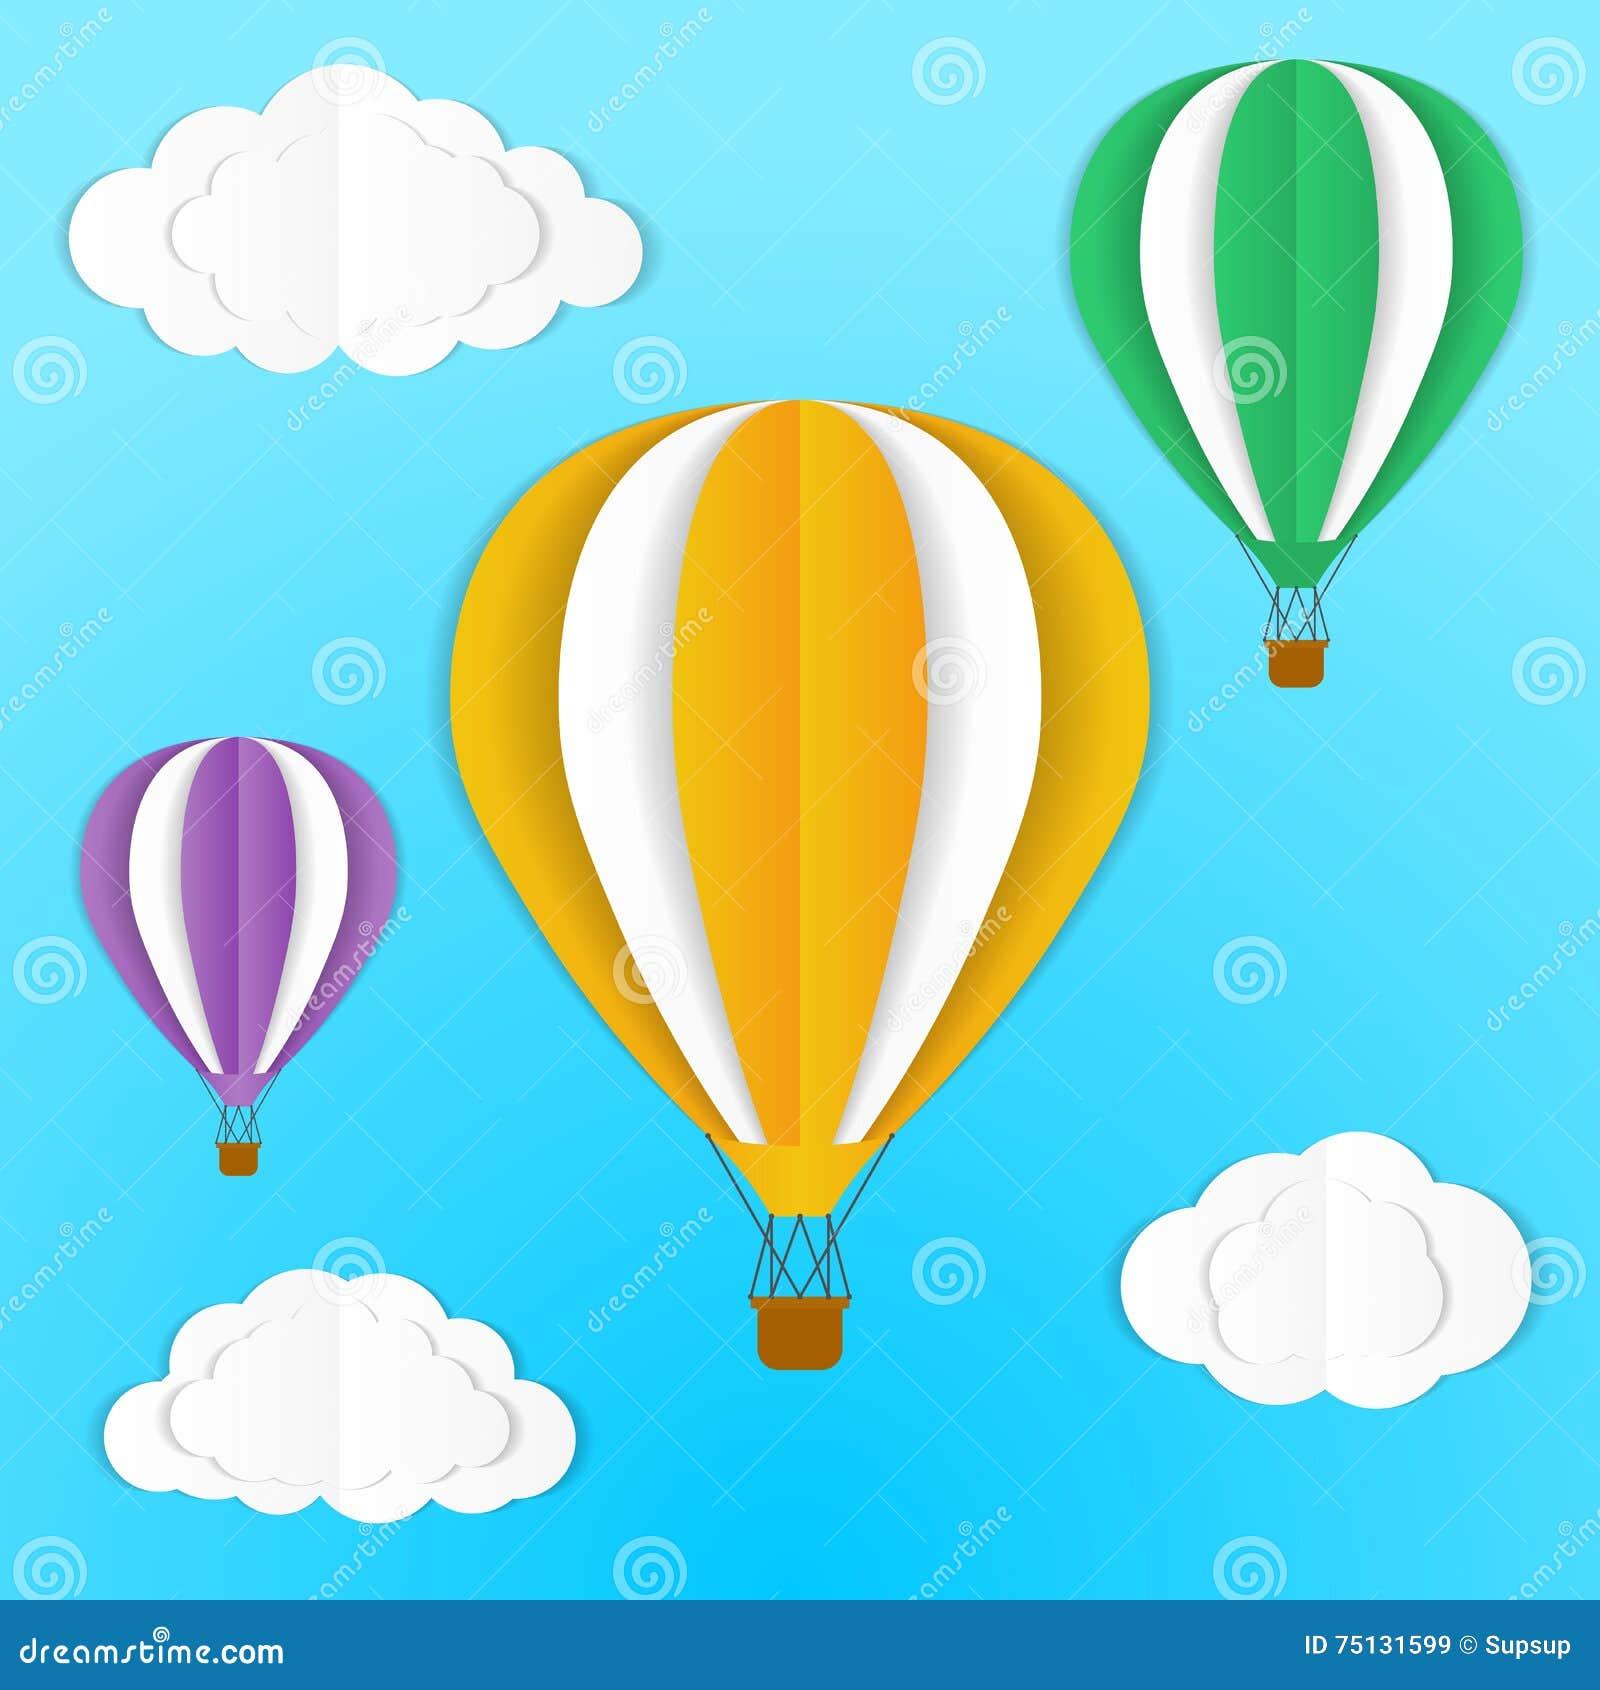 Origami air balloons stock vector illustration of model 75131599 origami air balloons jeuxipadfo Choice Image